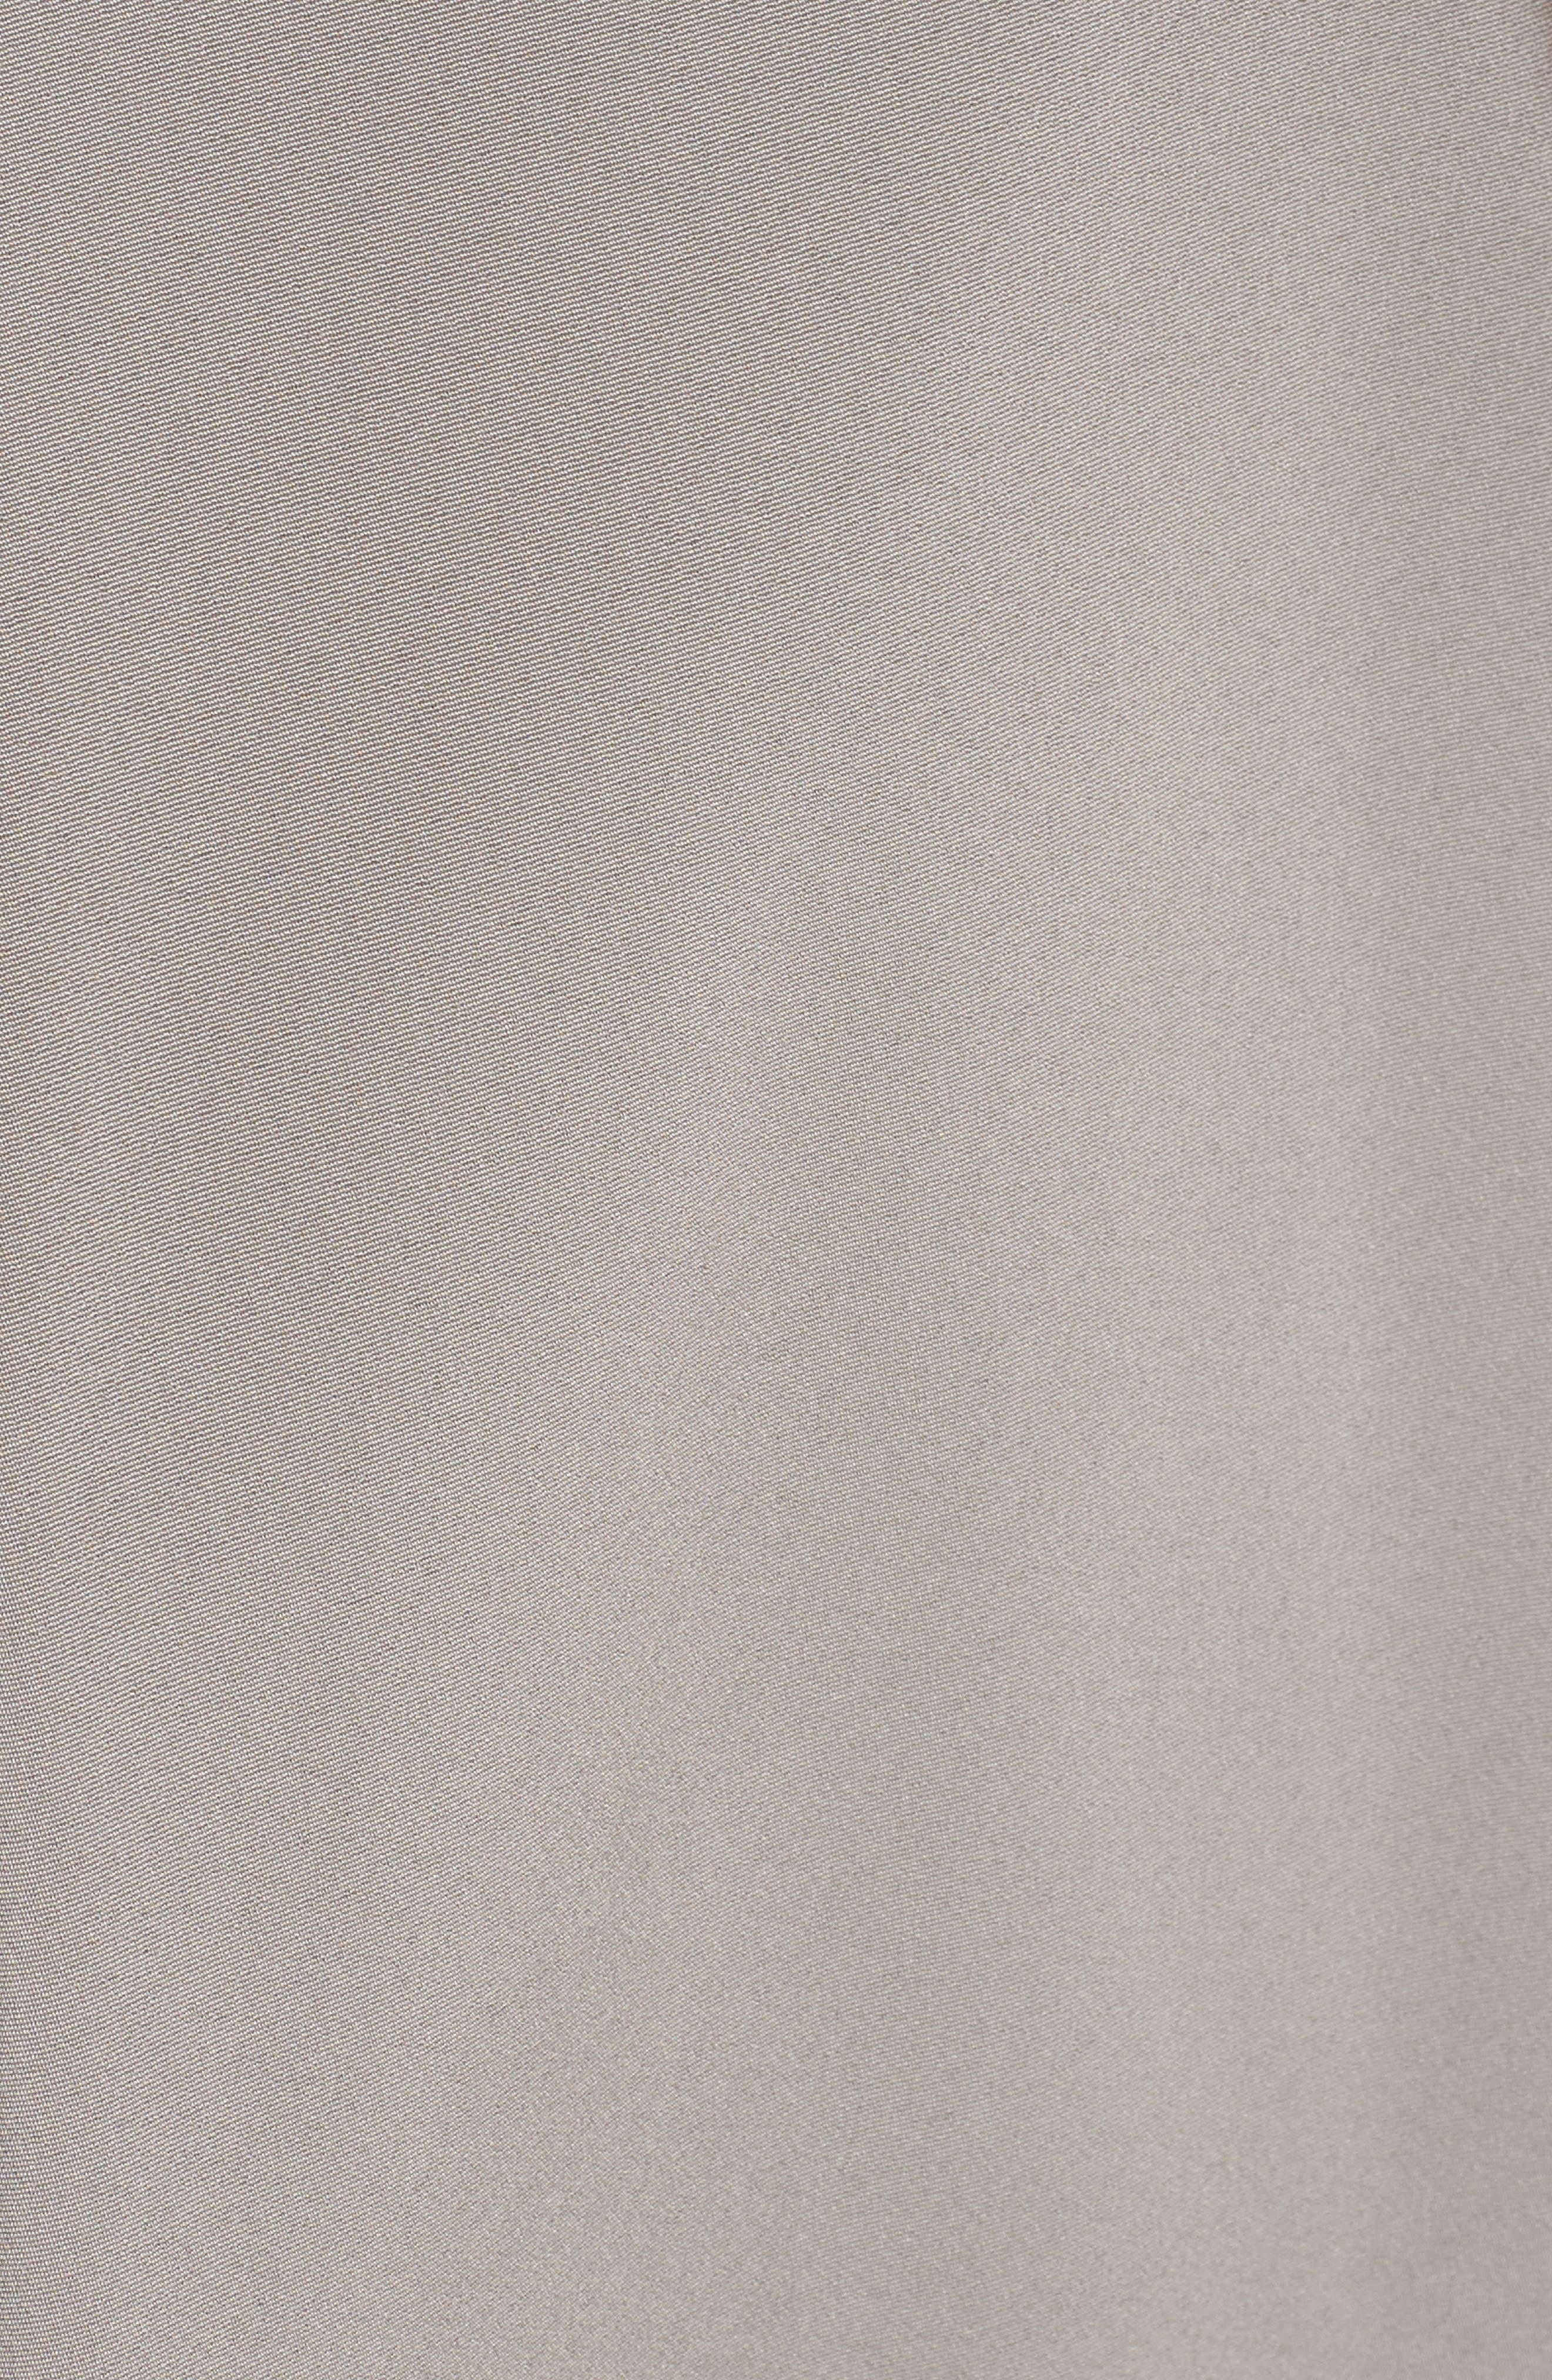 Illusion Sequin & Faille A-Line Gown,                             Alternate thumbnail 5, color,                             244